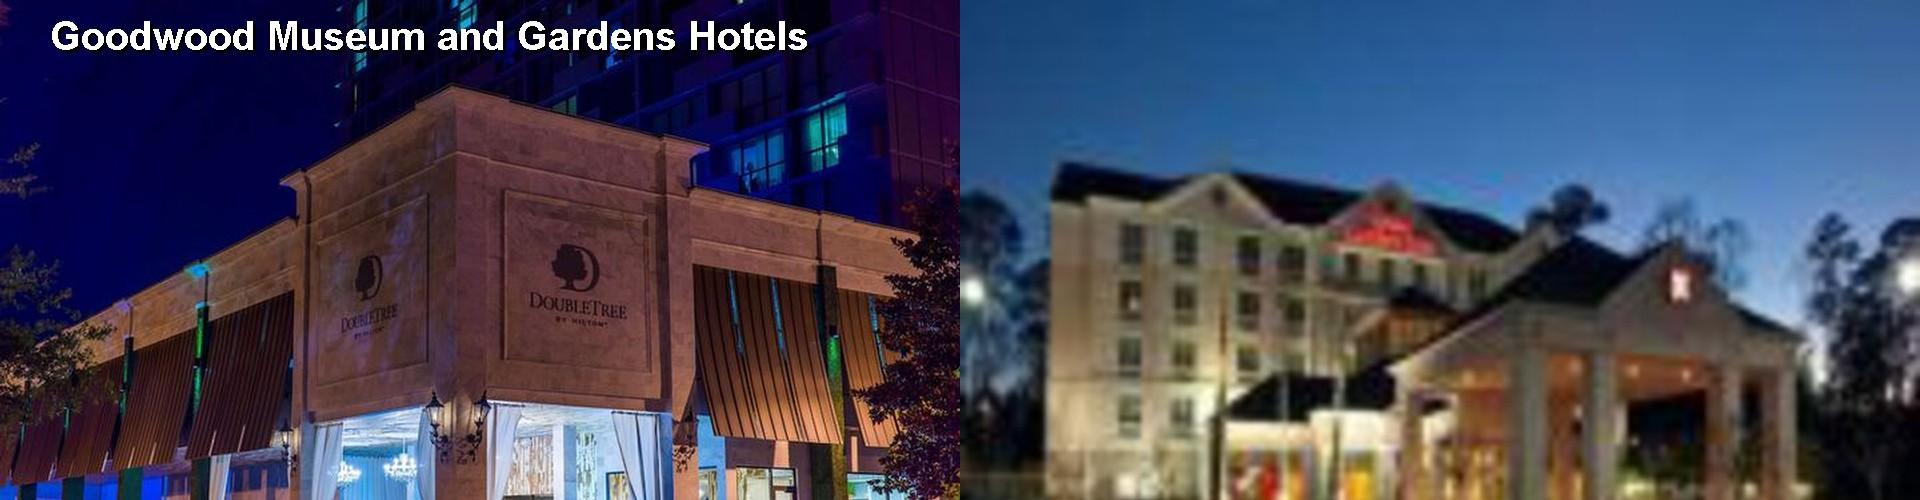 5 Best Hotels Near Goodwood Museum And Gardens